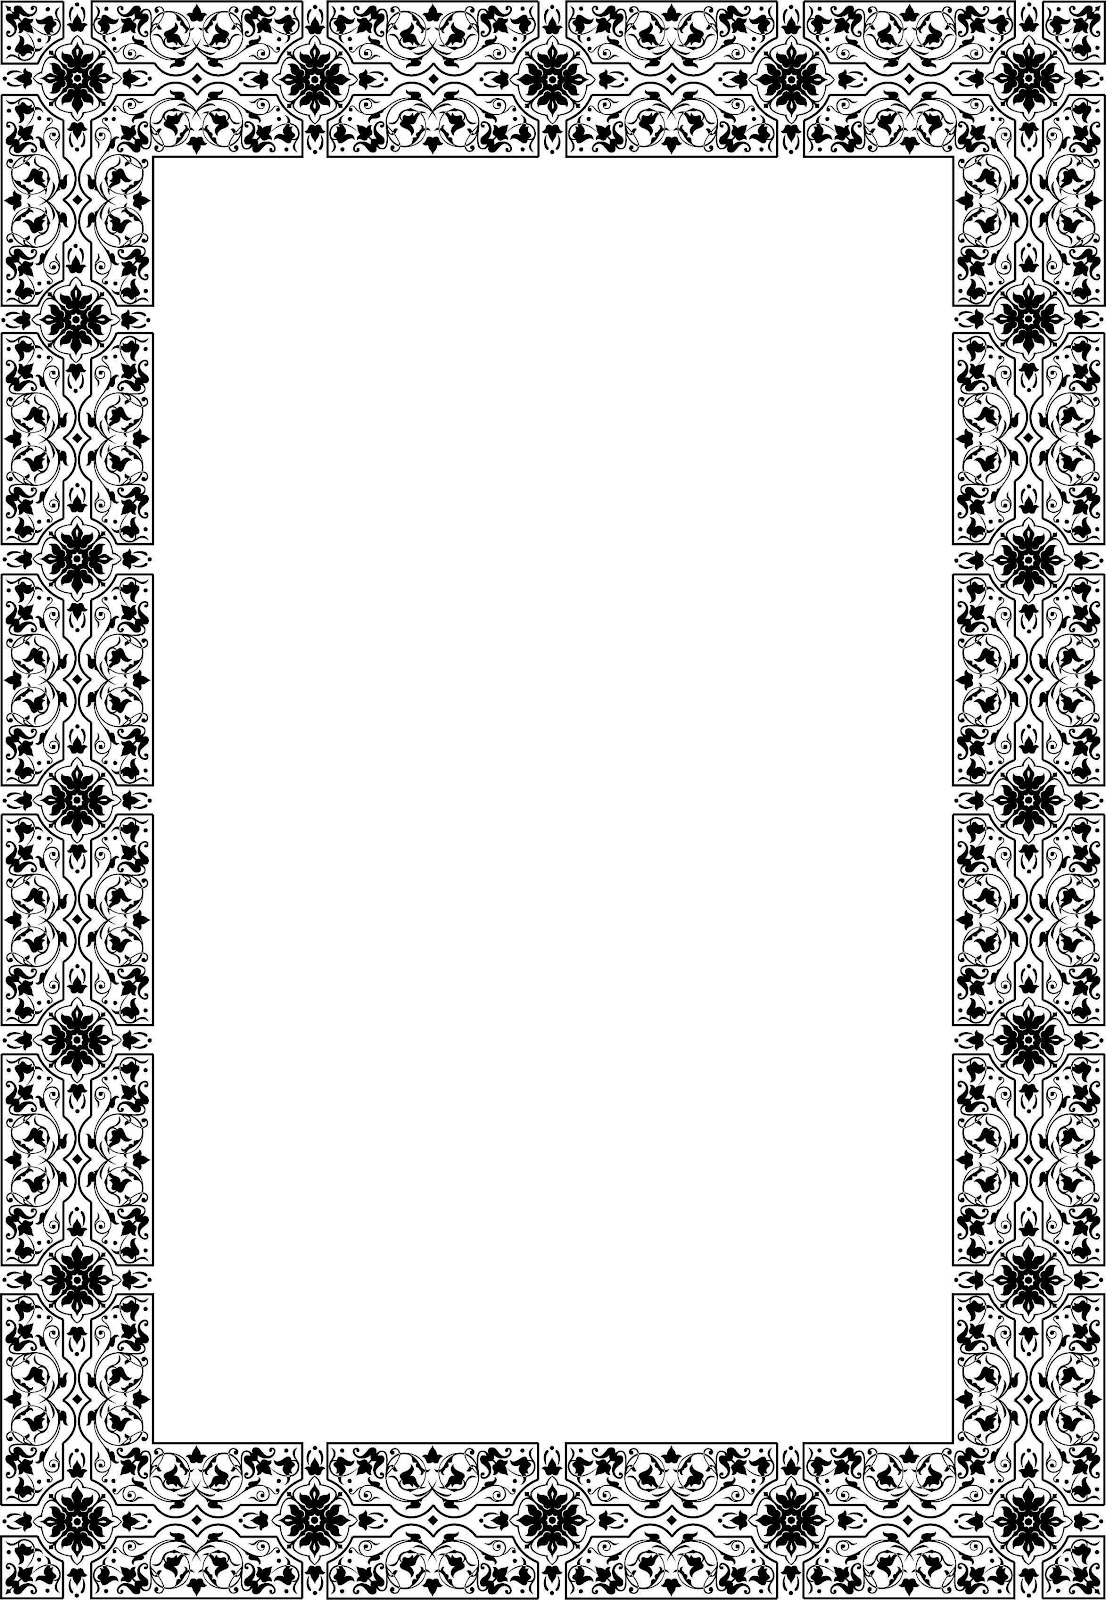 Bingkai / Border Piagam Vector (6)